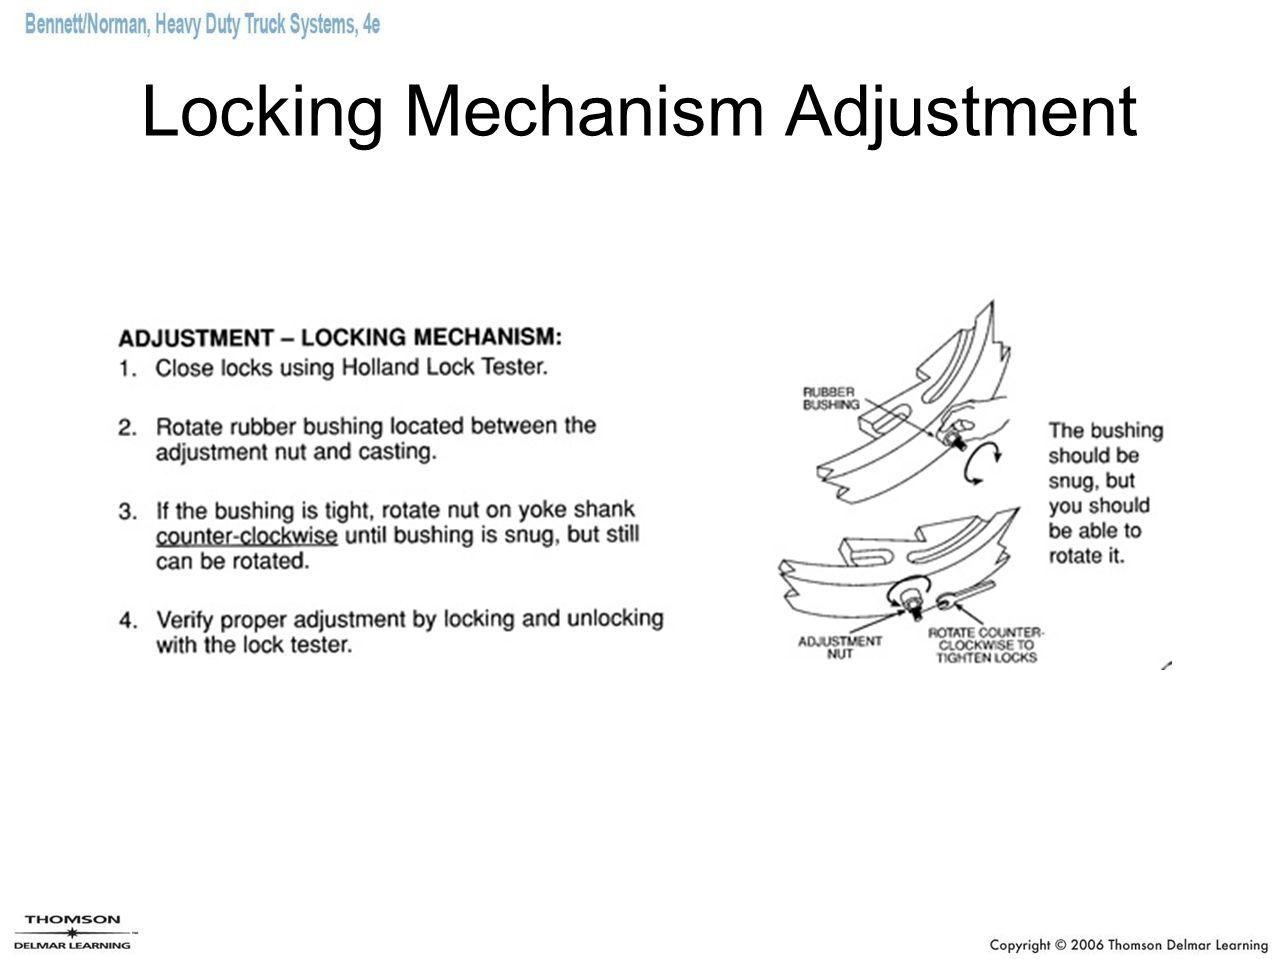 Locking Mechanism Adjustment